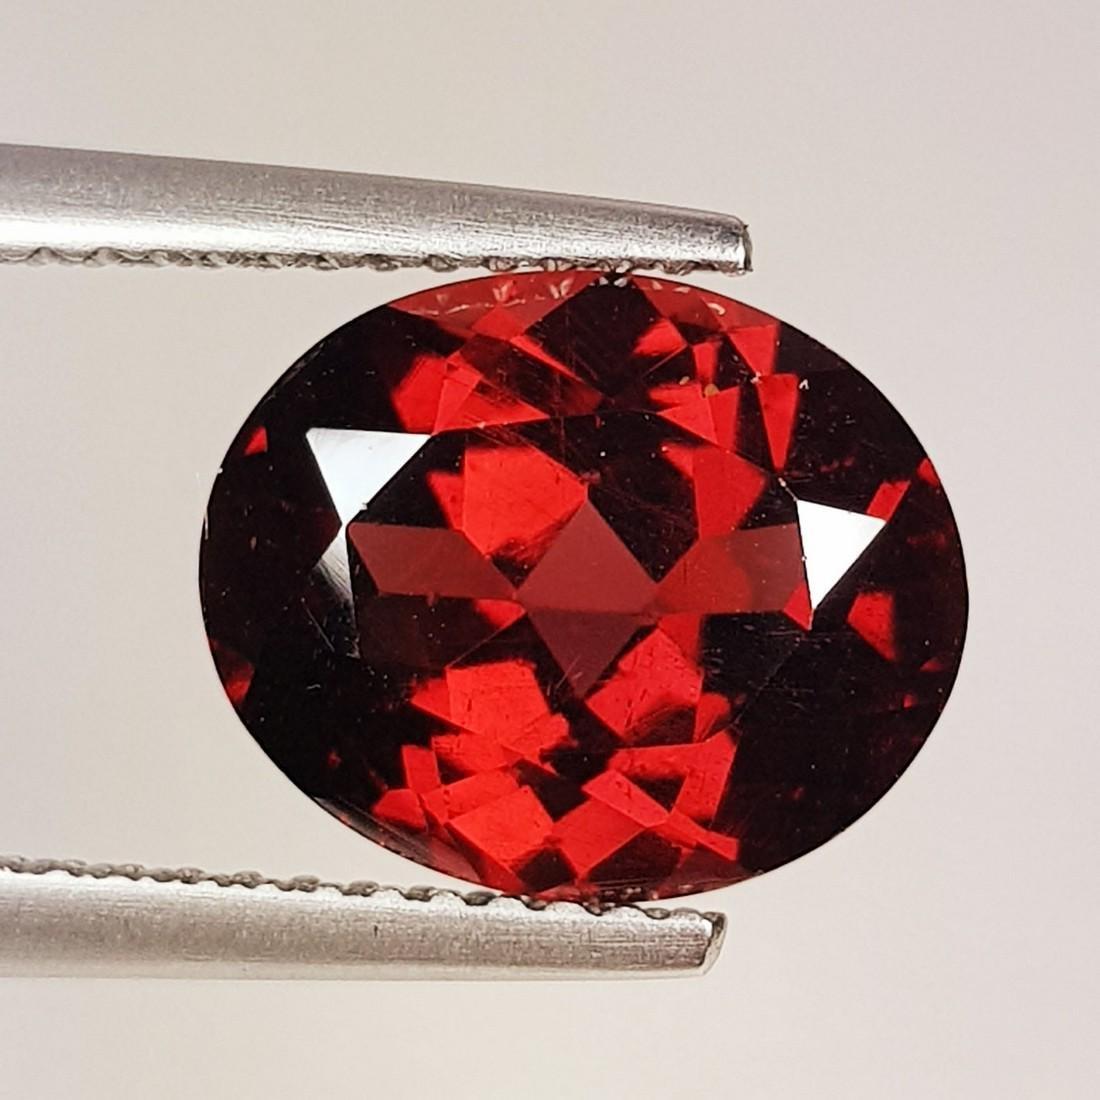 Natural Rhodolite Garnet Oval Cut 4.80 ct